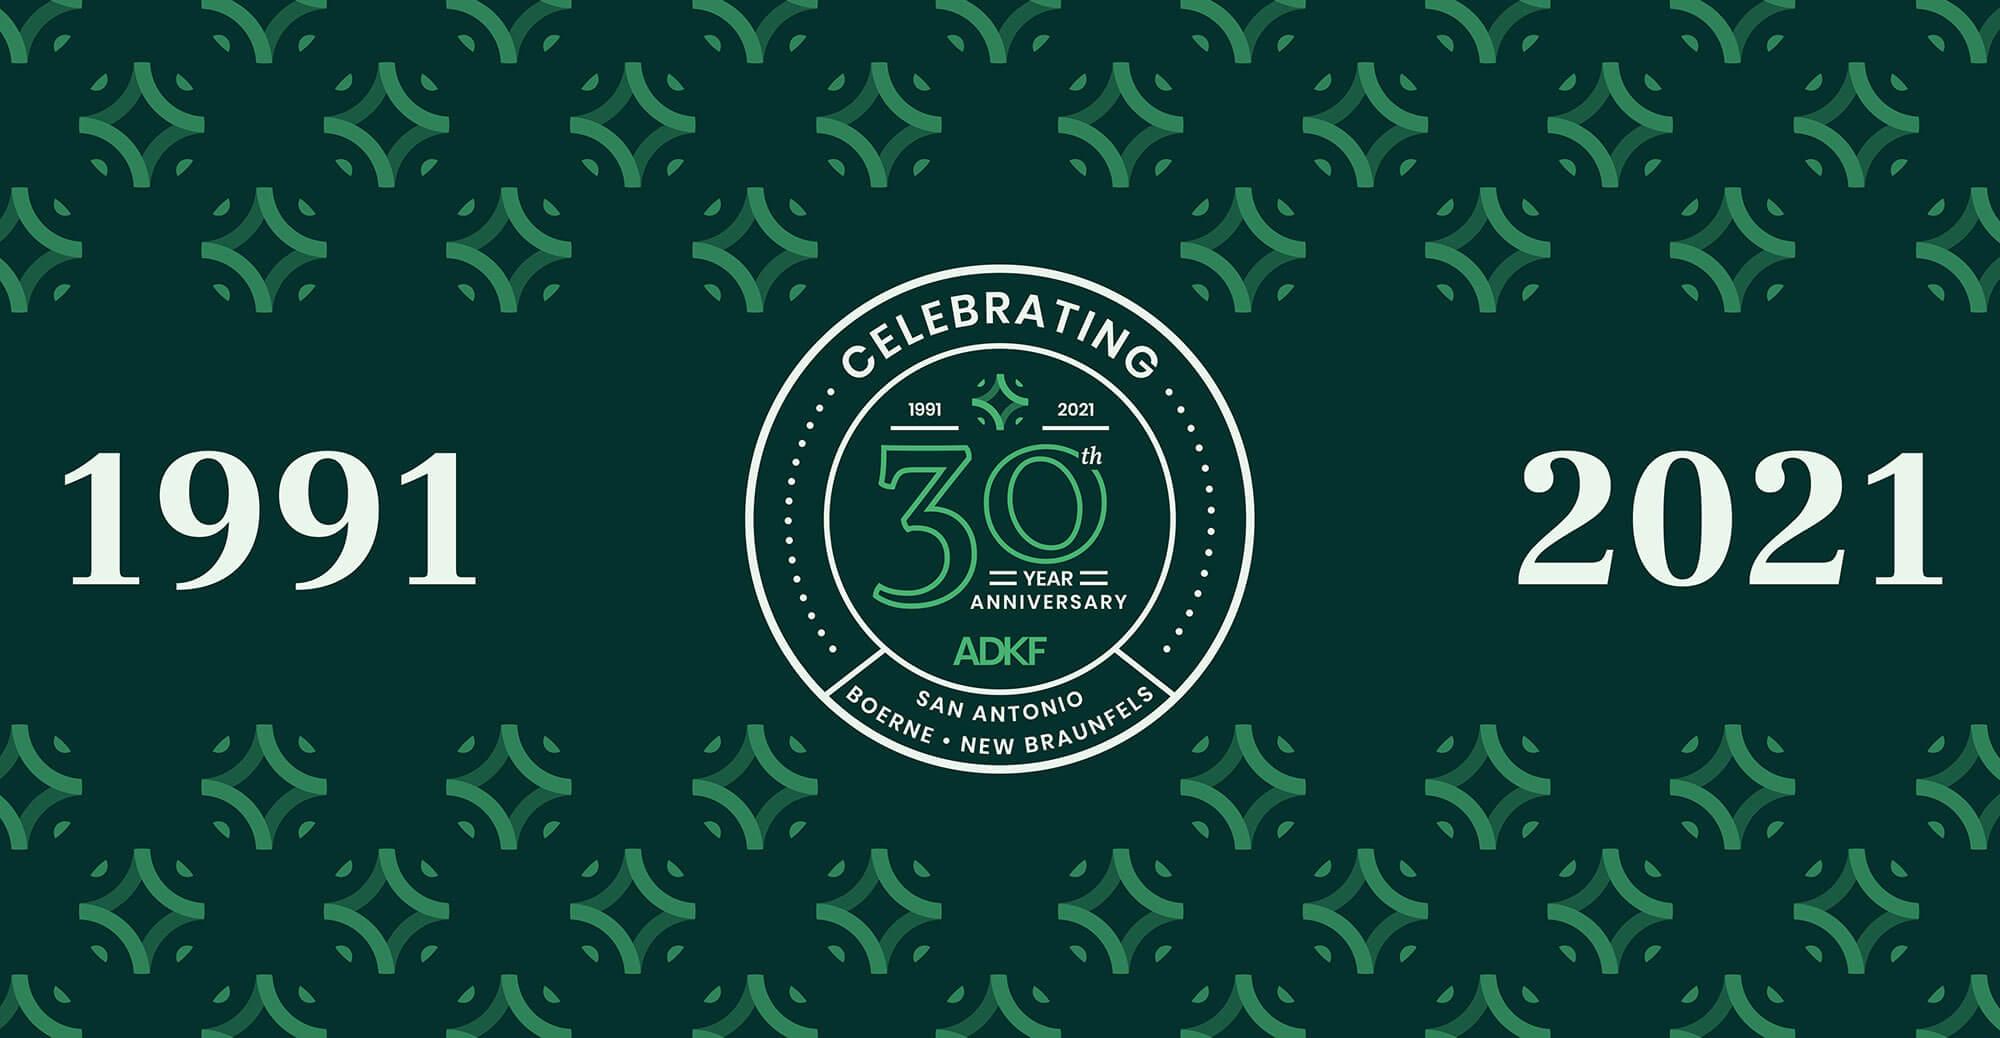 ADKF Celebrates 30th Anniversary with a Branding Refresh